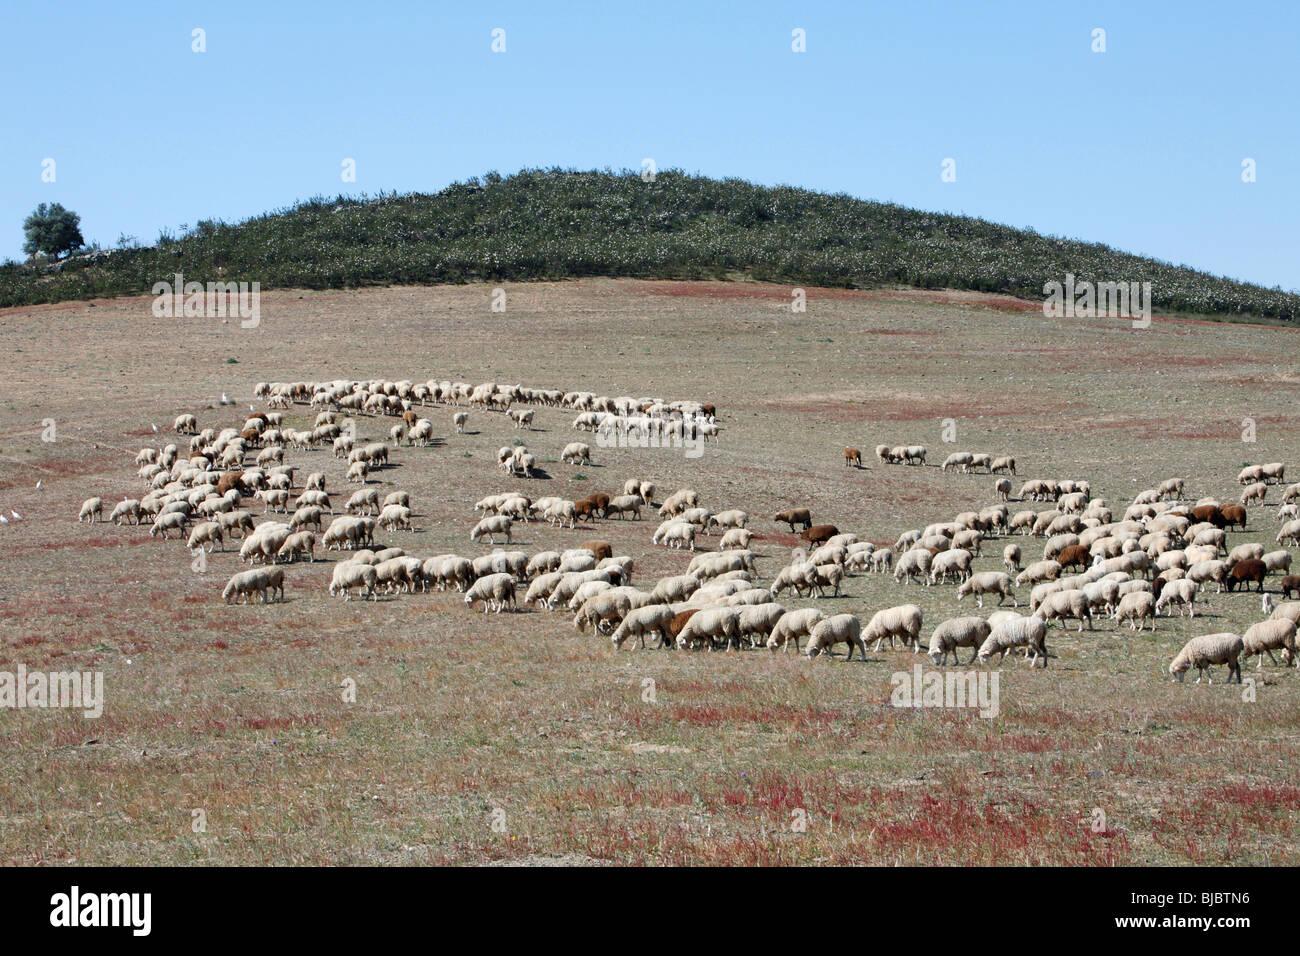 Merino Sheep, (Ovis aries), flock grazing in national park Herdade de Sao Marcos great bustard reserve, Alentejo, - Stock Image